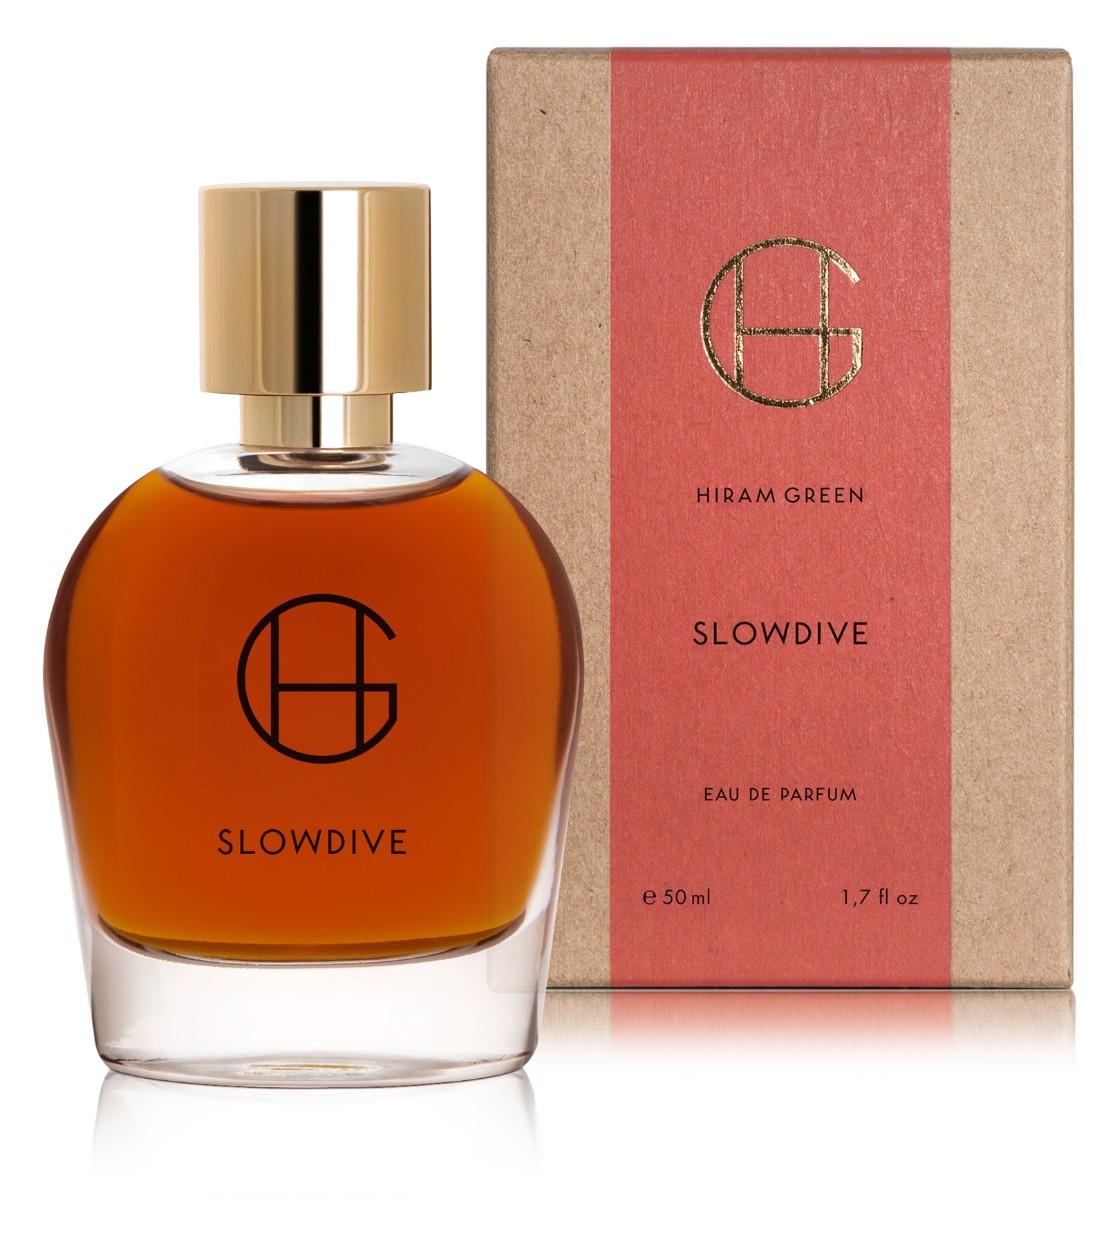 Hiram Green Slowdive аромат для мужчин и женщин